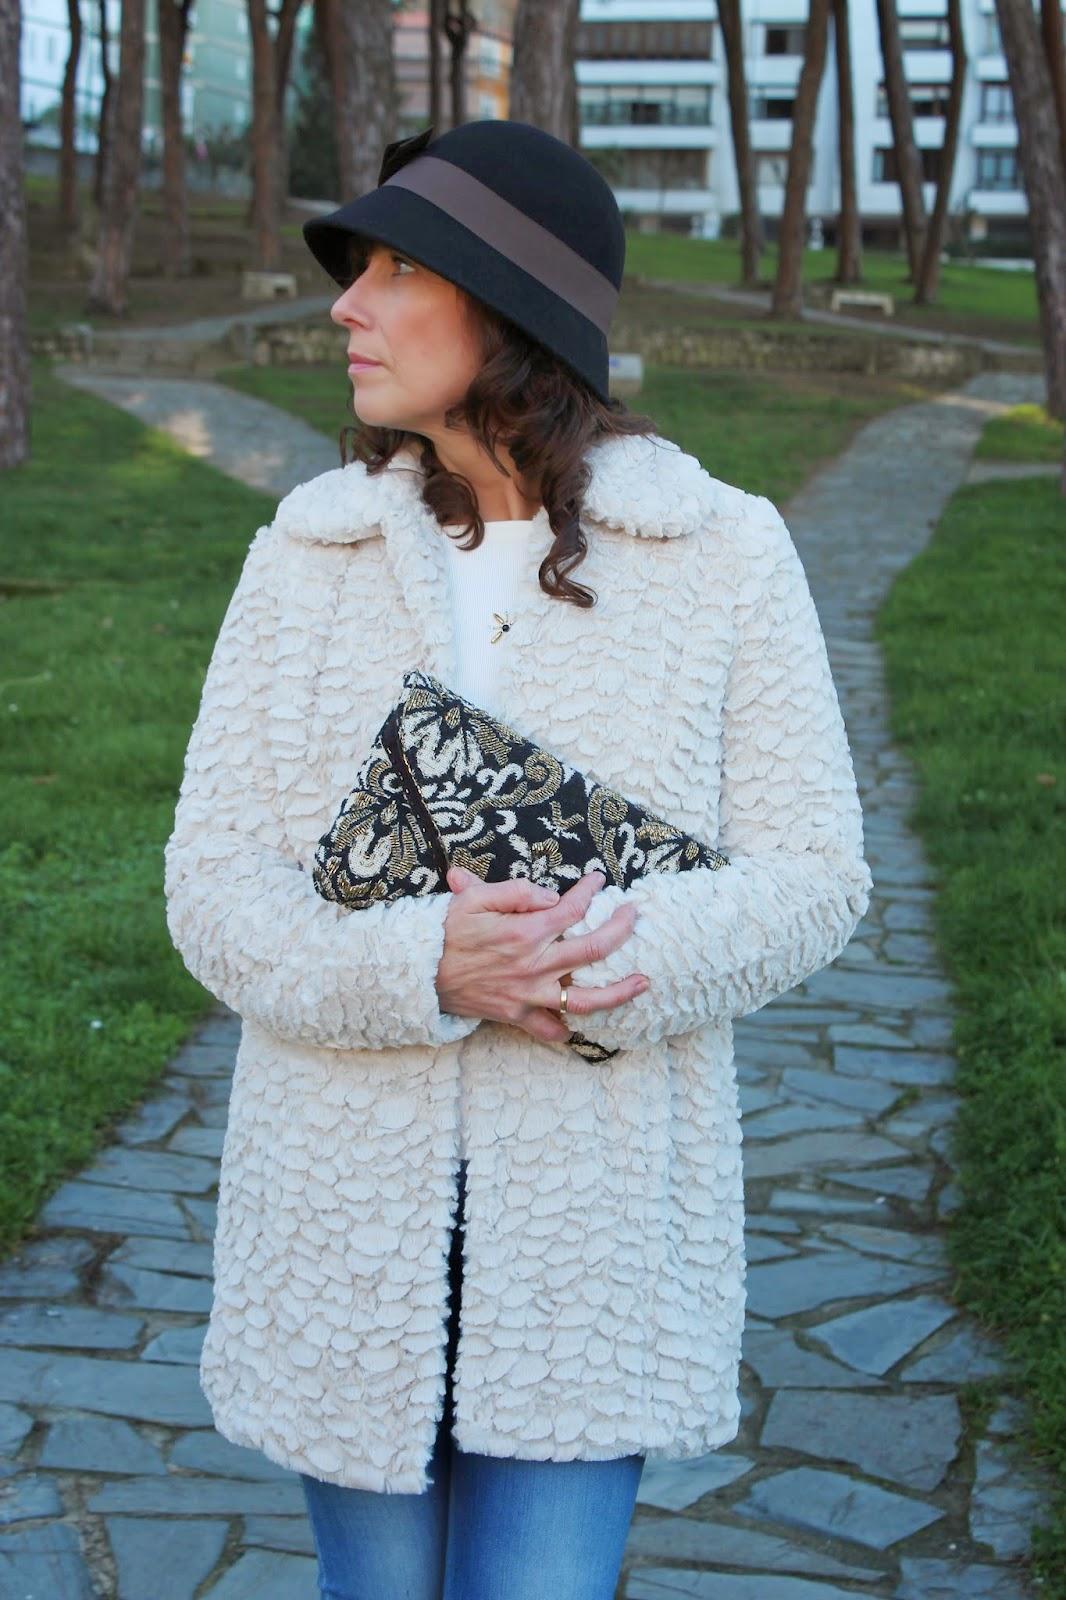 Br jula de estilo mis looks abrigo peluche y jeans - Brujula de estilo ...